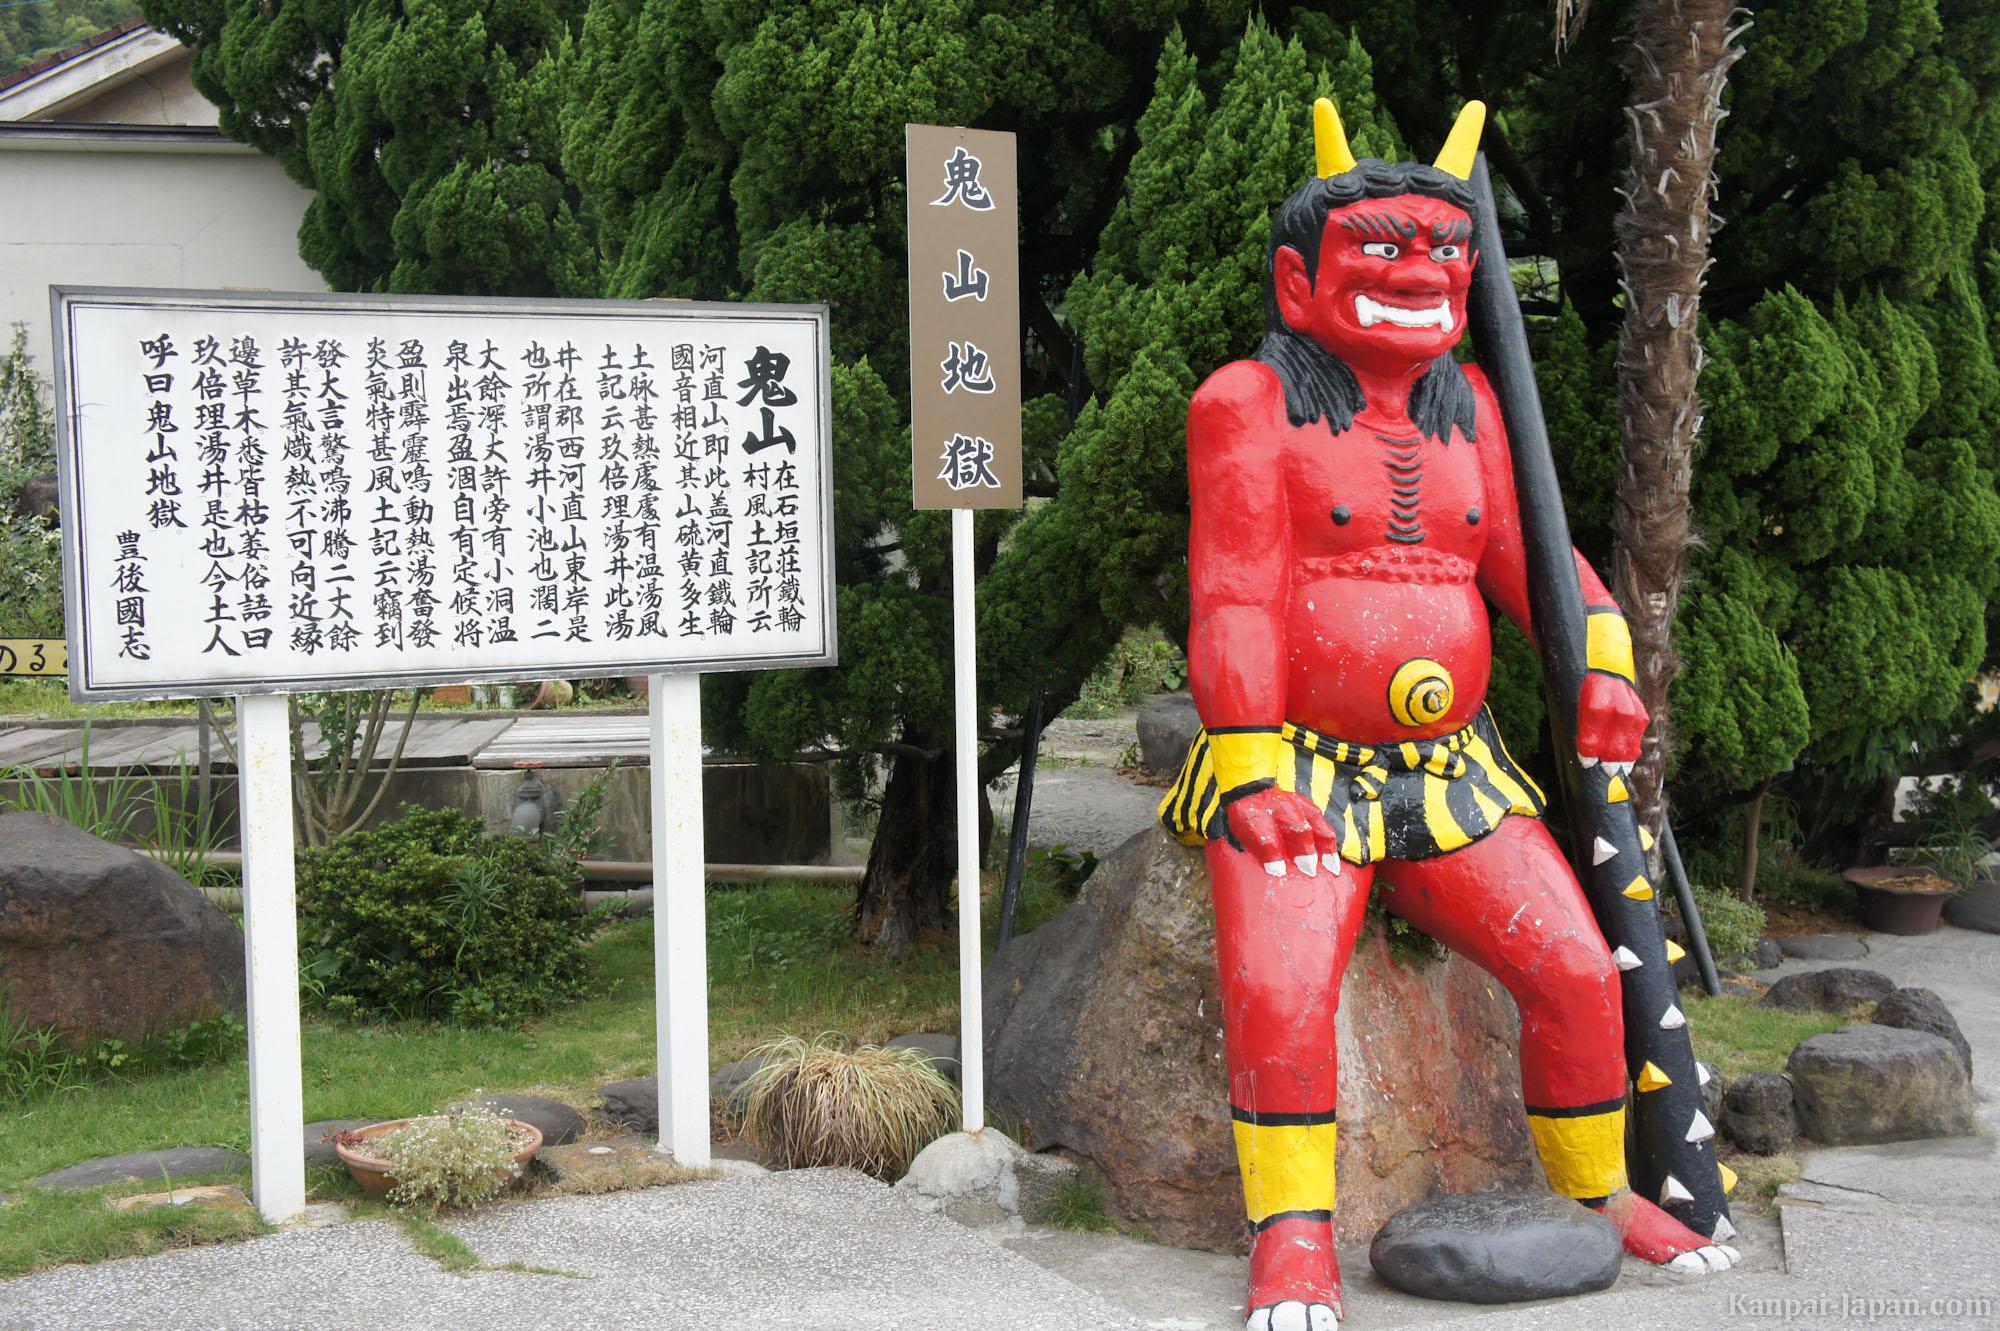 Jigoku Meguri - The eight hells of Beppu